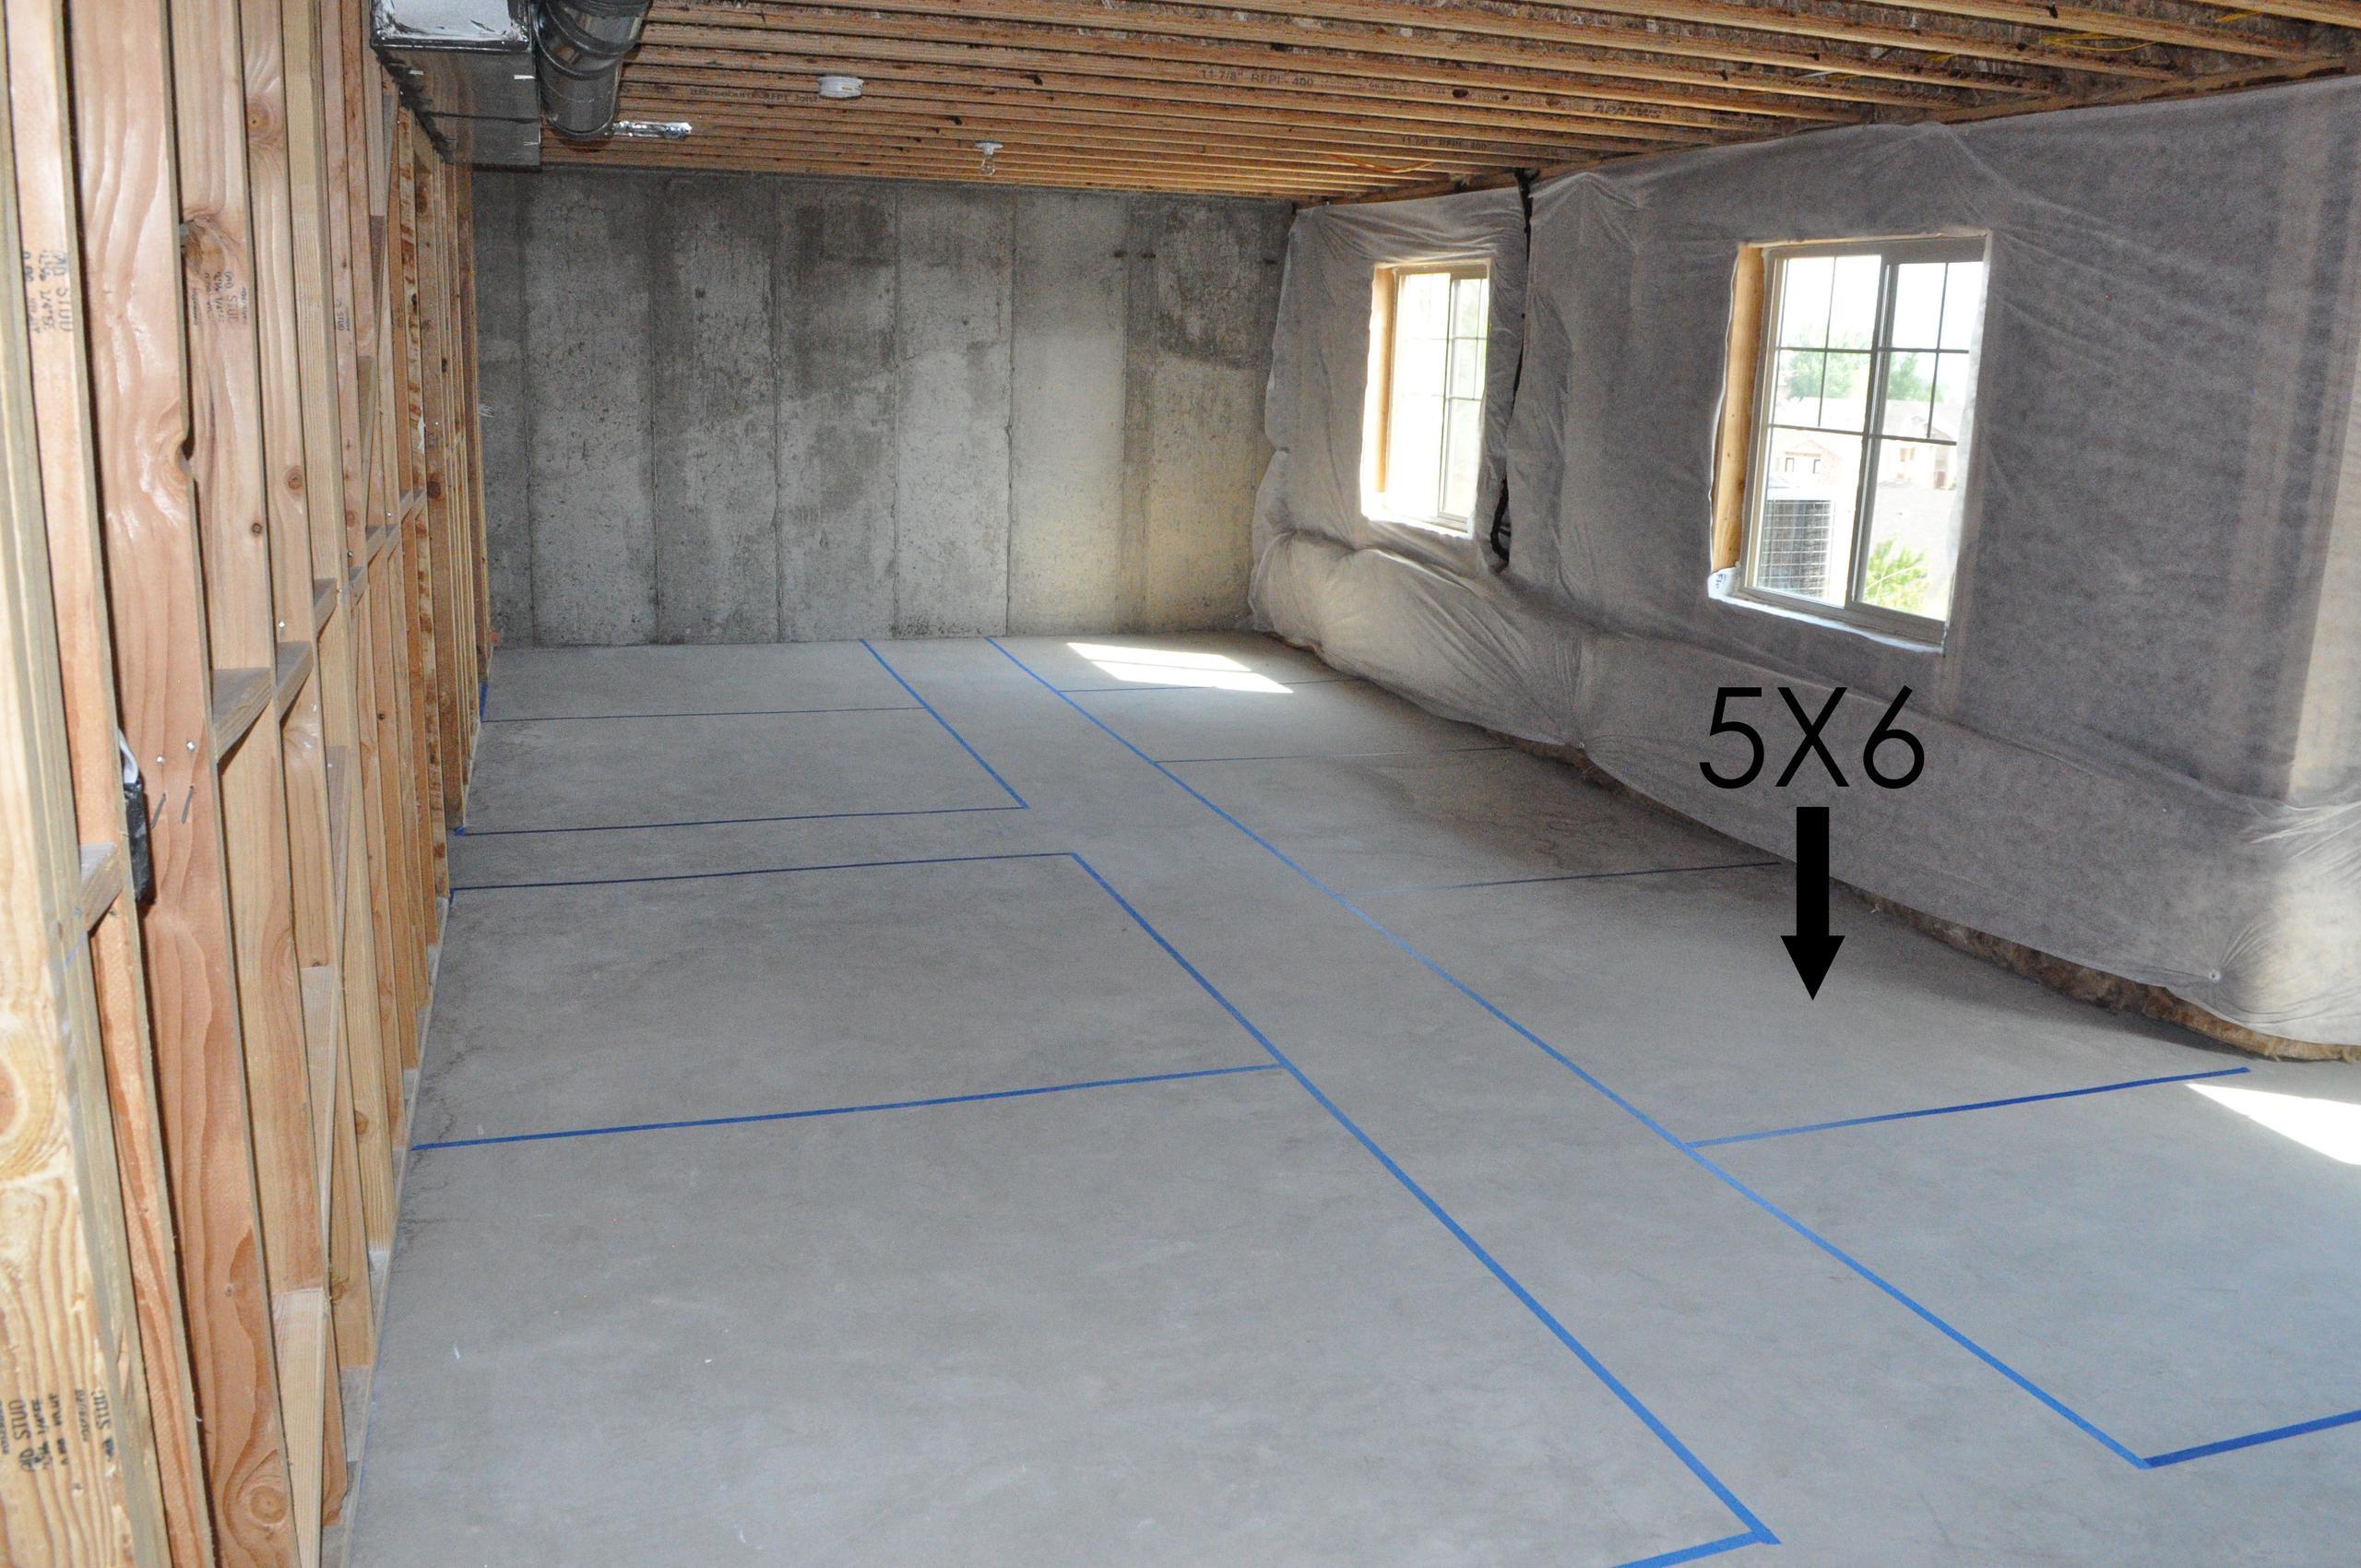 5x6 Basement self storage unit